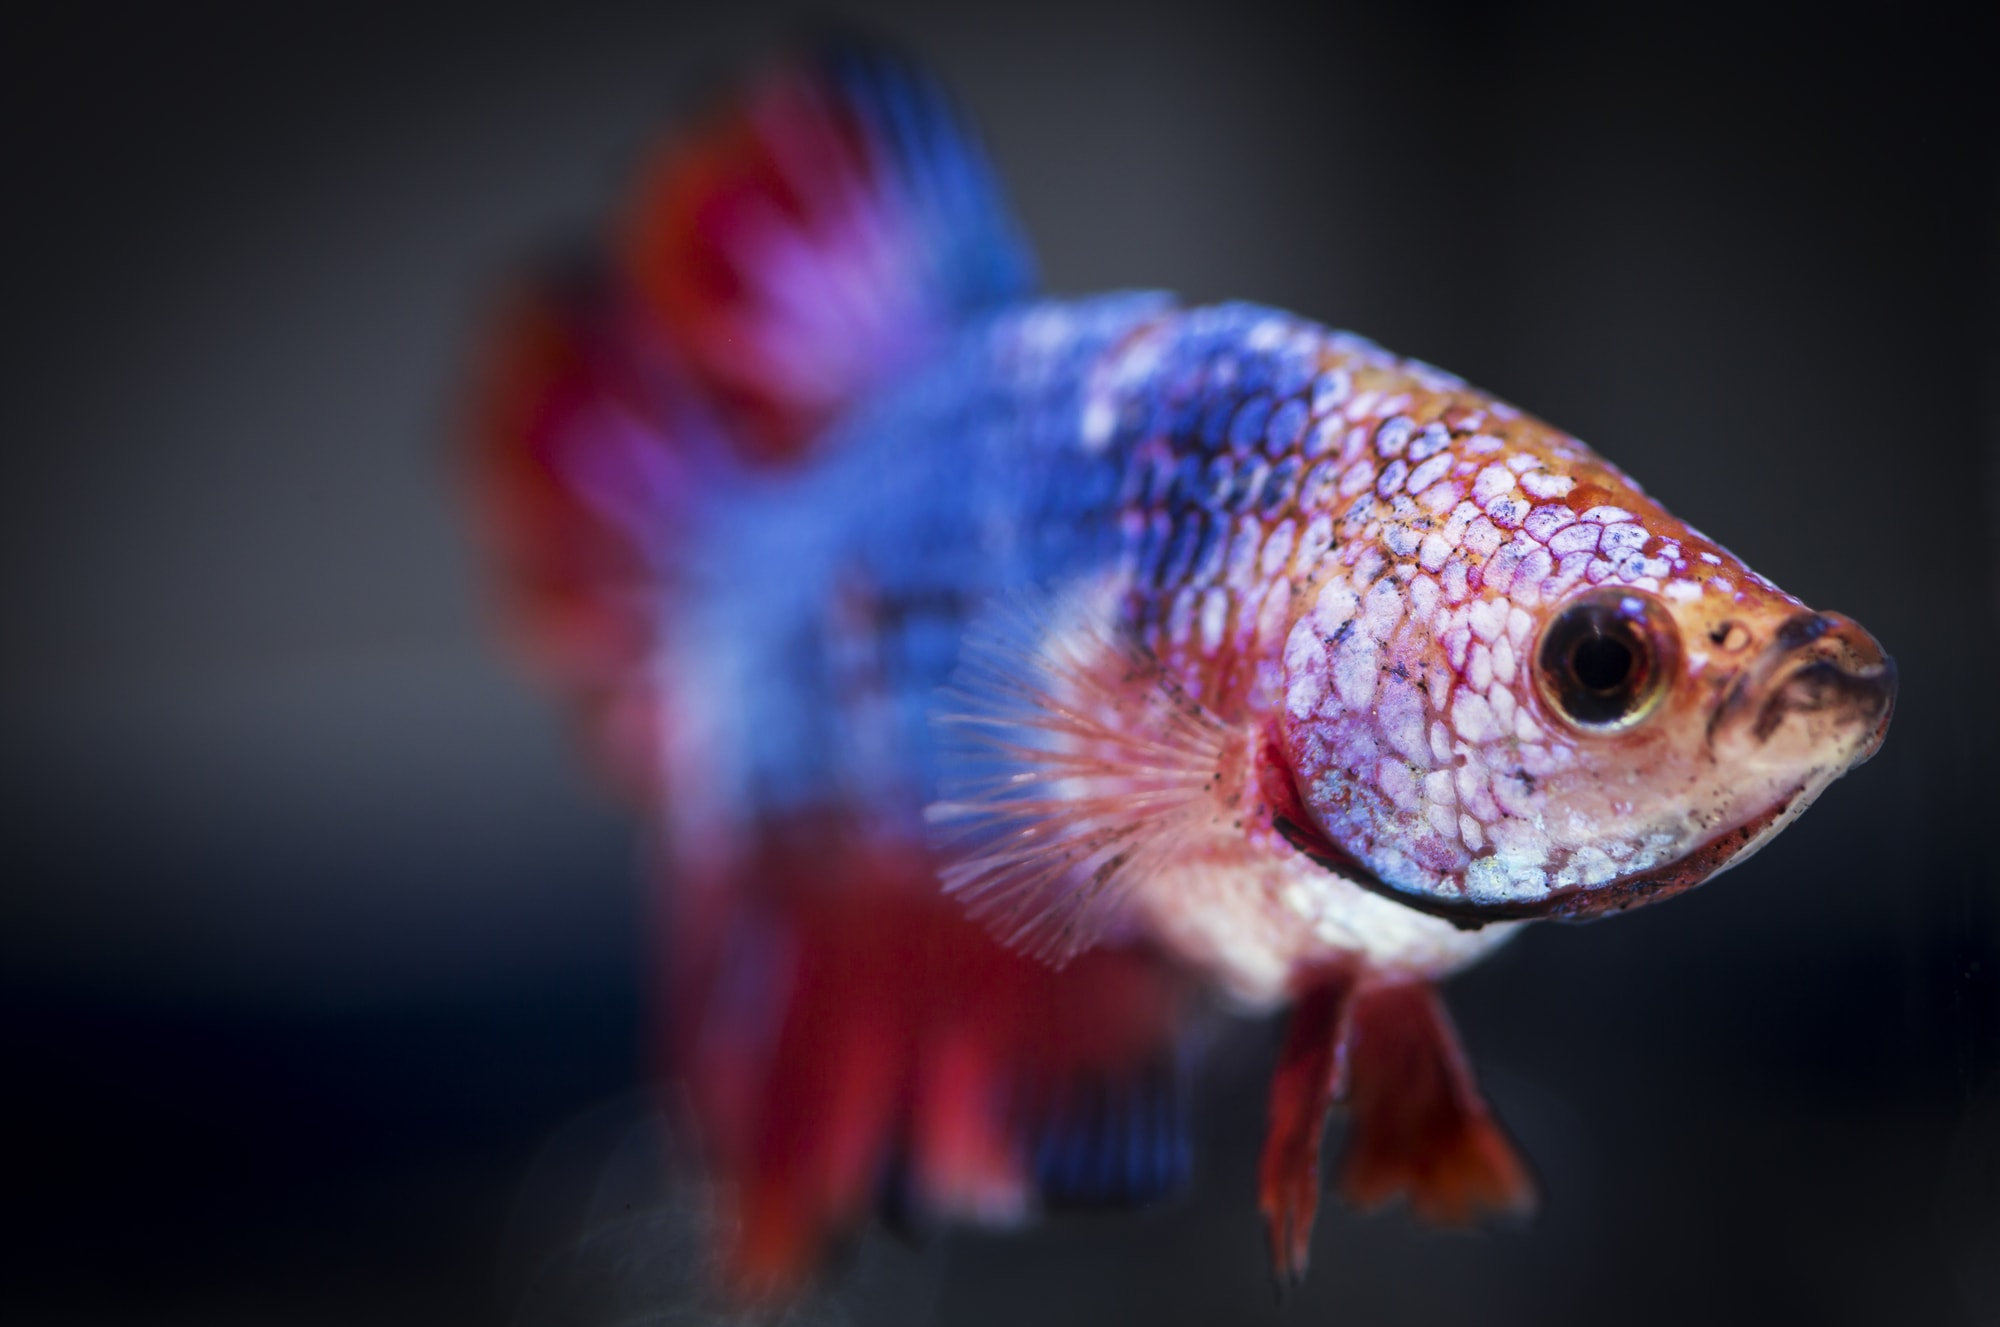 betta fish with gill flukes